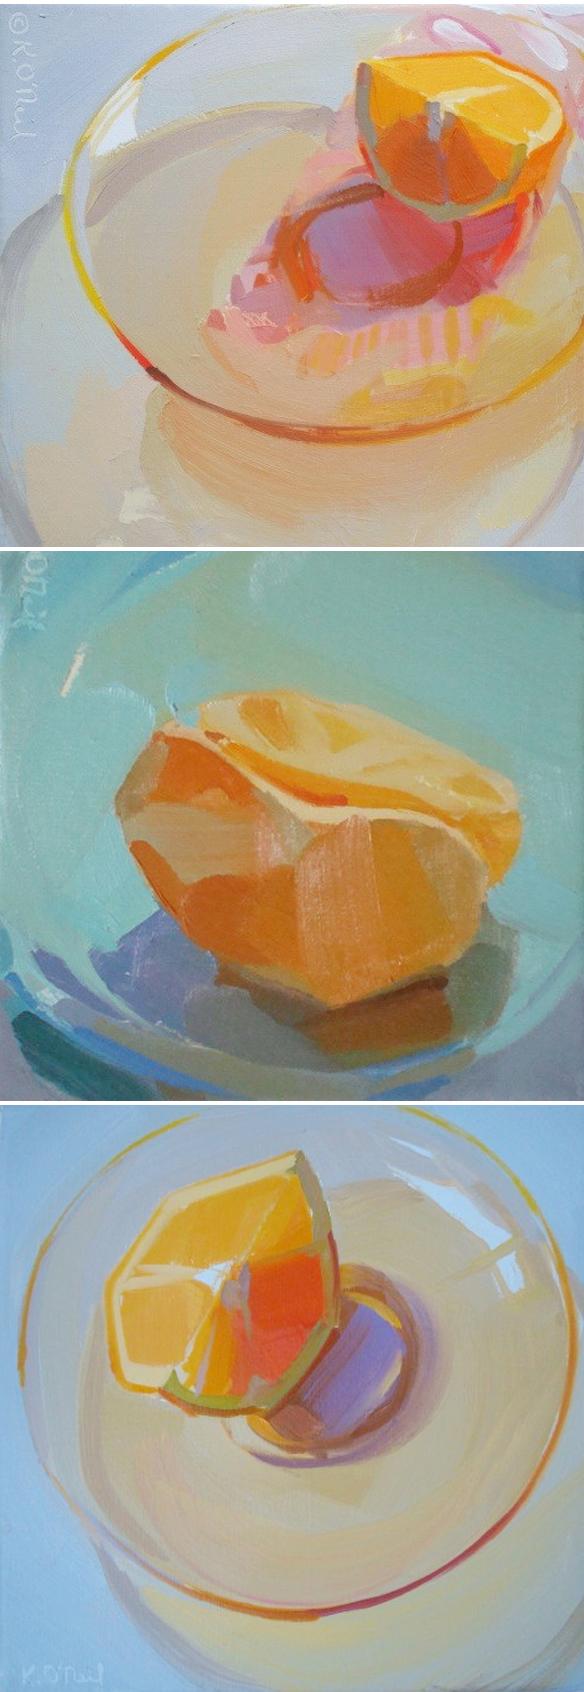 karen oneil peinture assiette d'orange fraicheur d'été